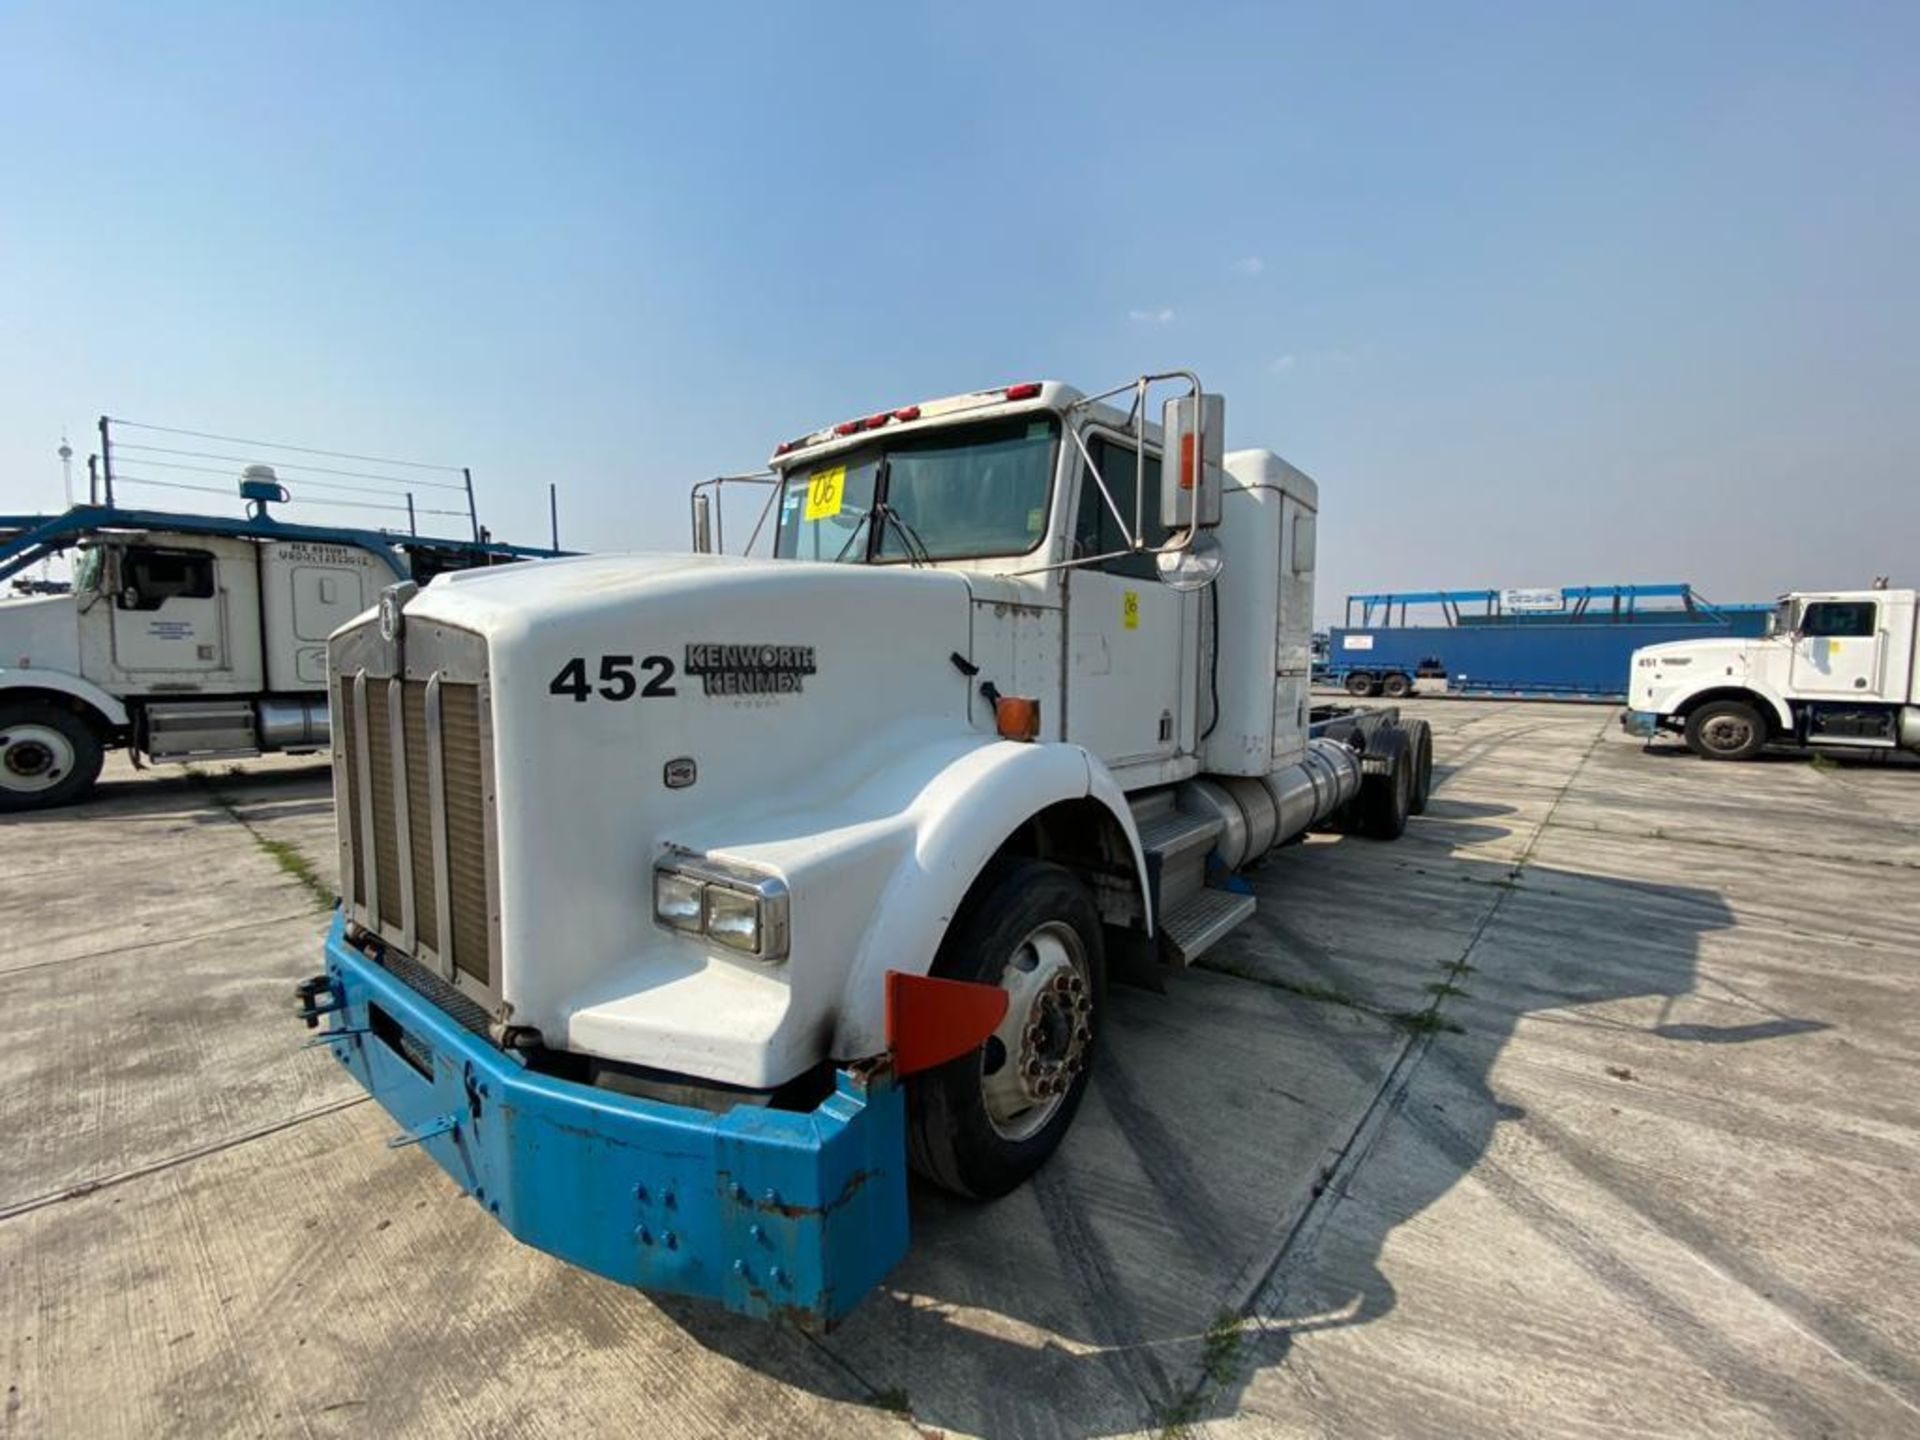 1998 Kenworth Sleeper truck tractor, standard transmission of 18 speeds - Image 6 of 75